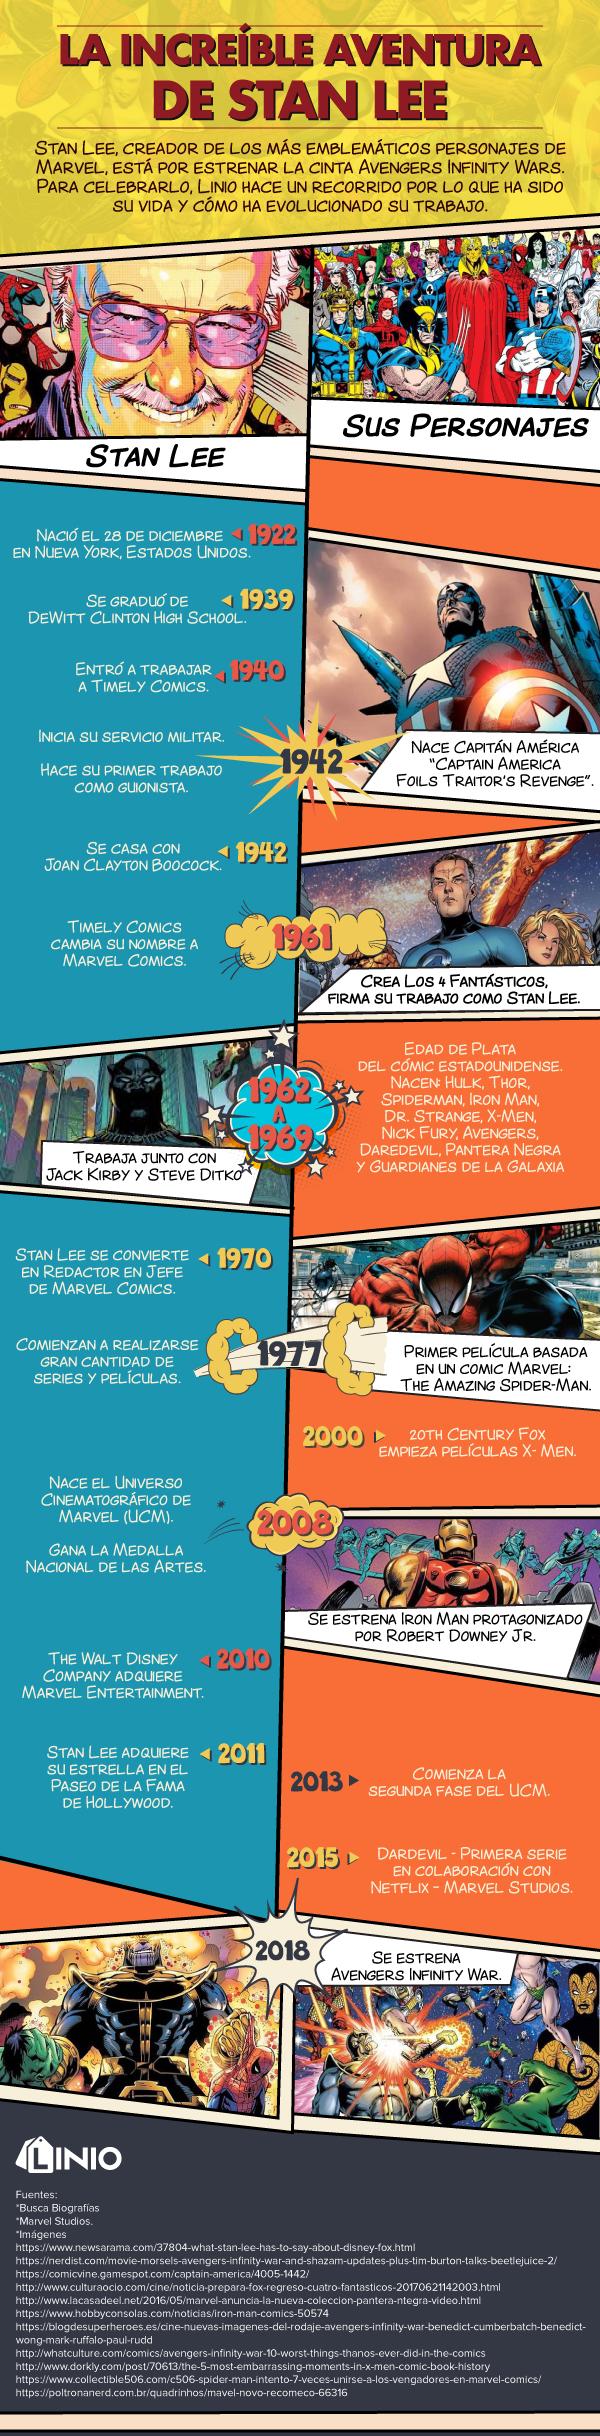 La increíble aventura de Stan Lee y sus personajes - avengers_linio_infografia